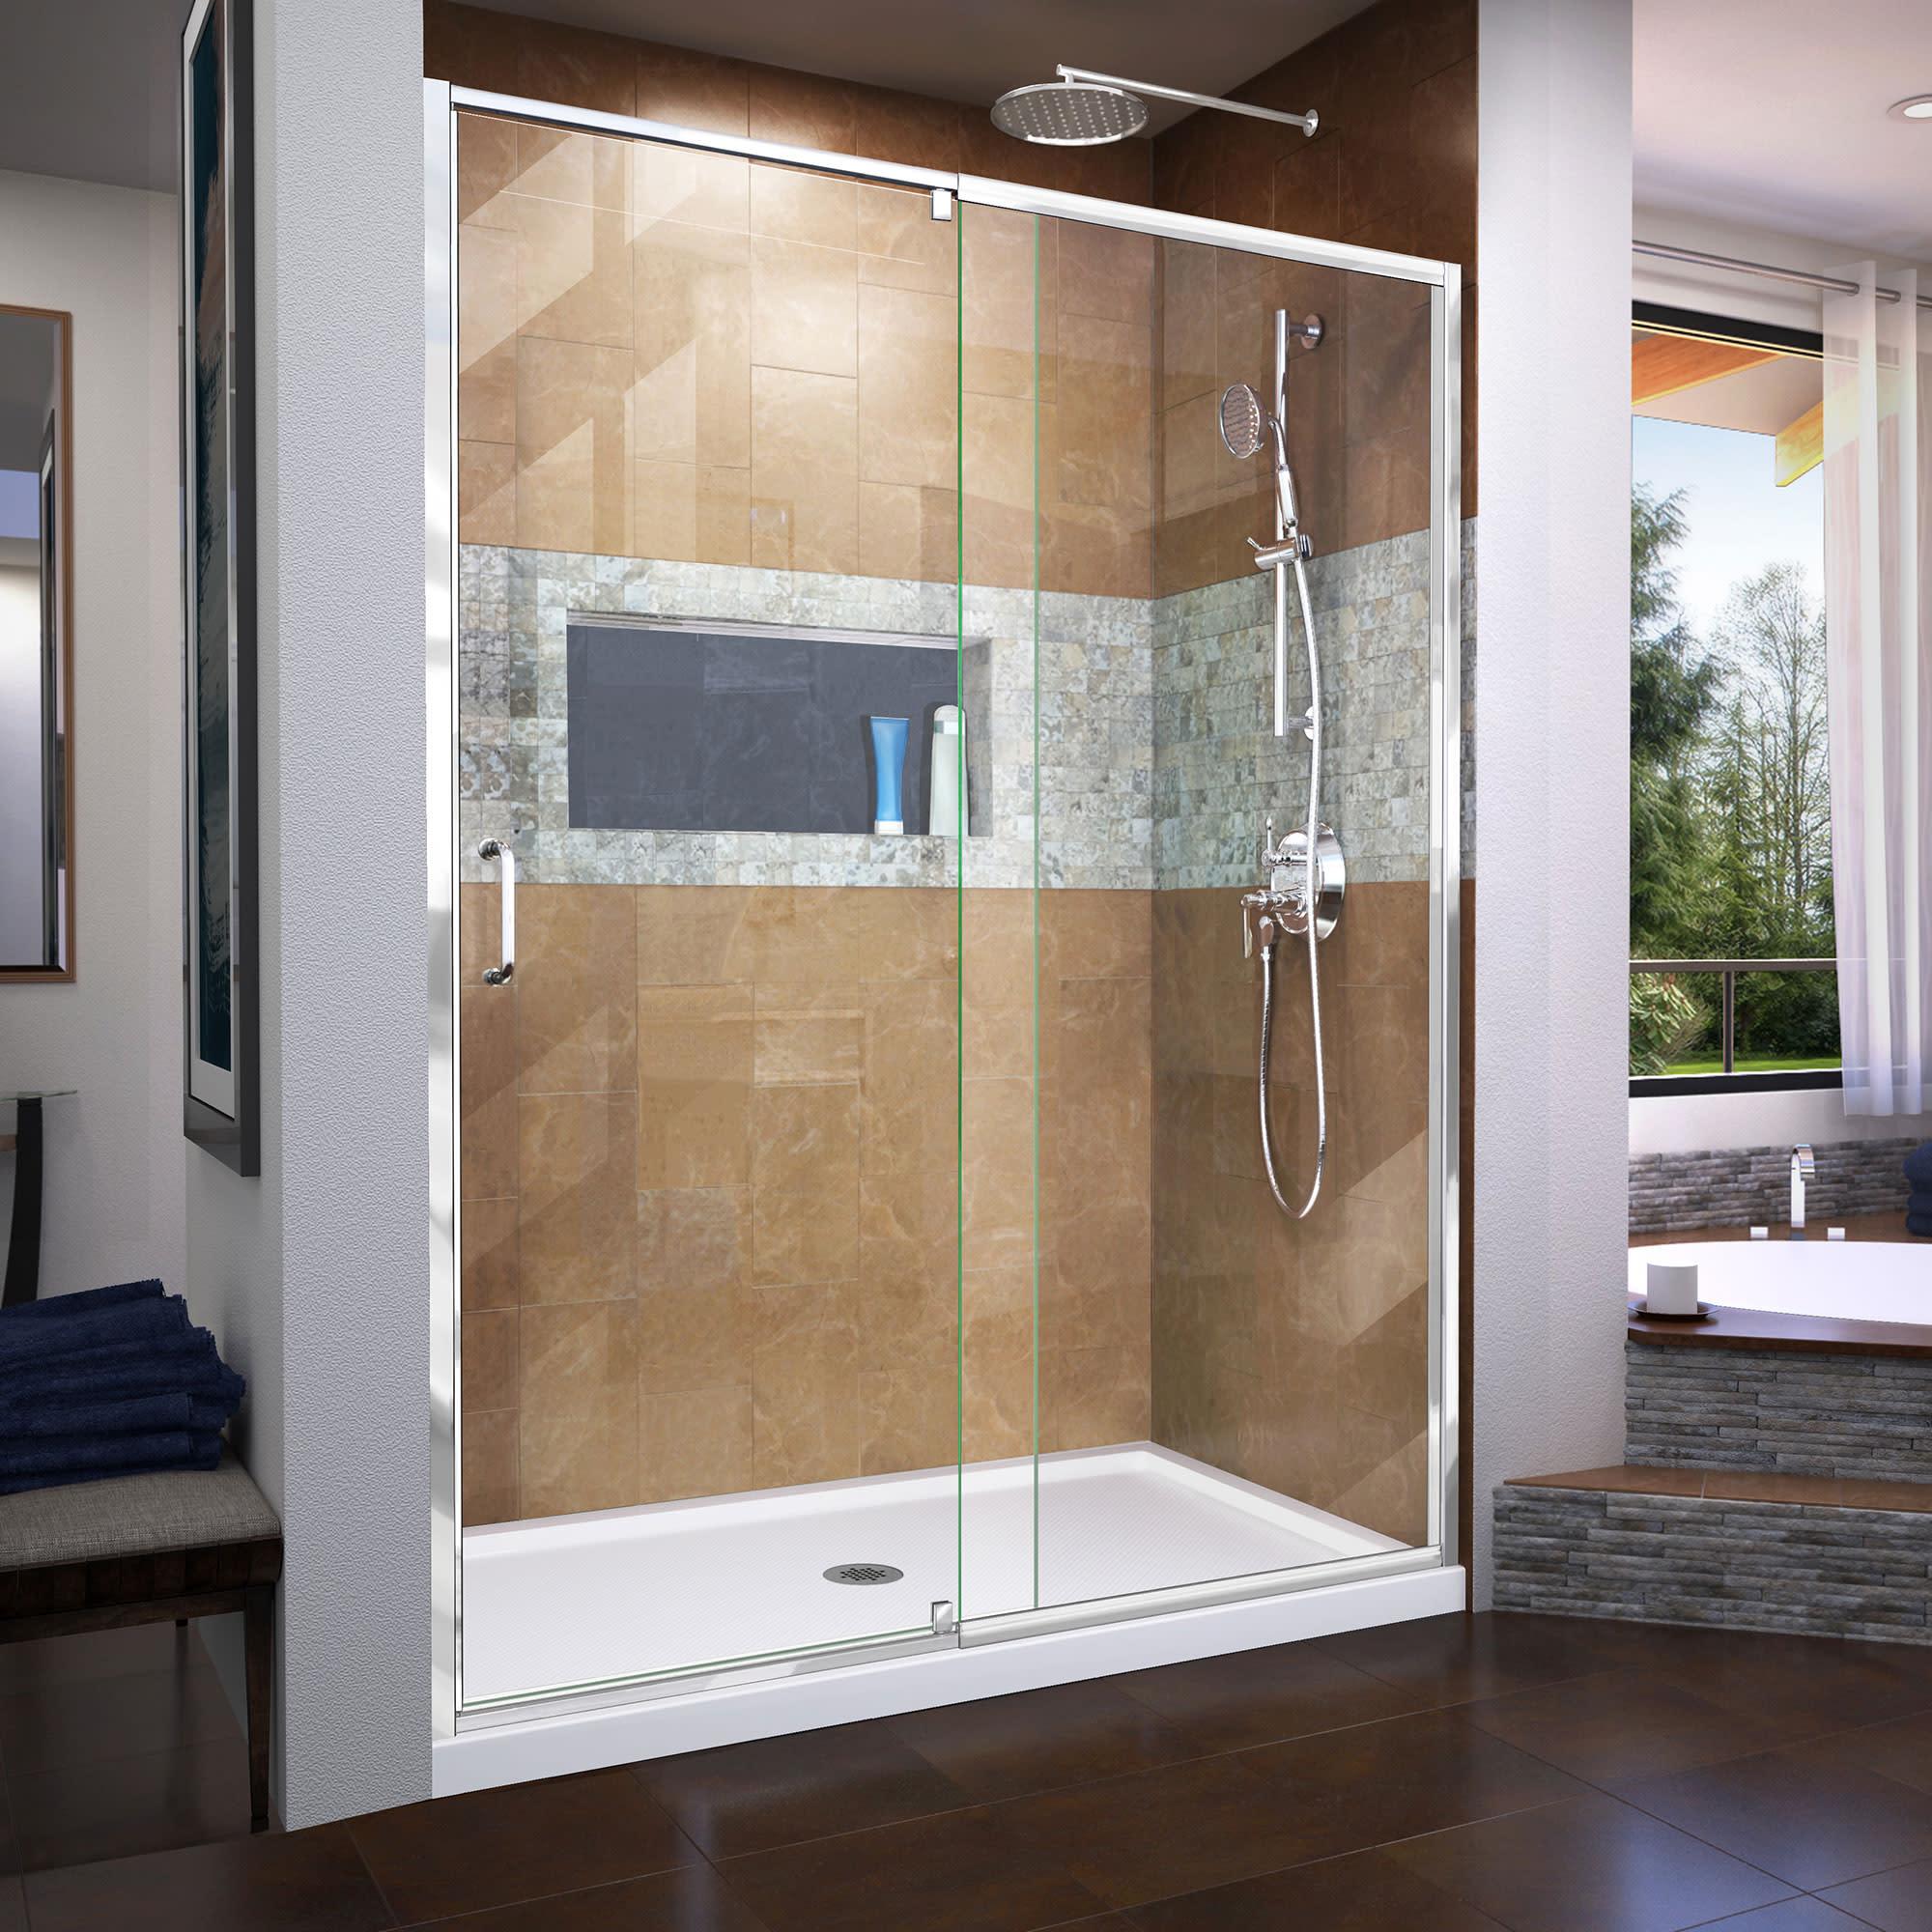 Dreamline Dl 6223 Flex Shower Door And Base Qualitybath